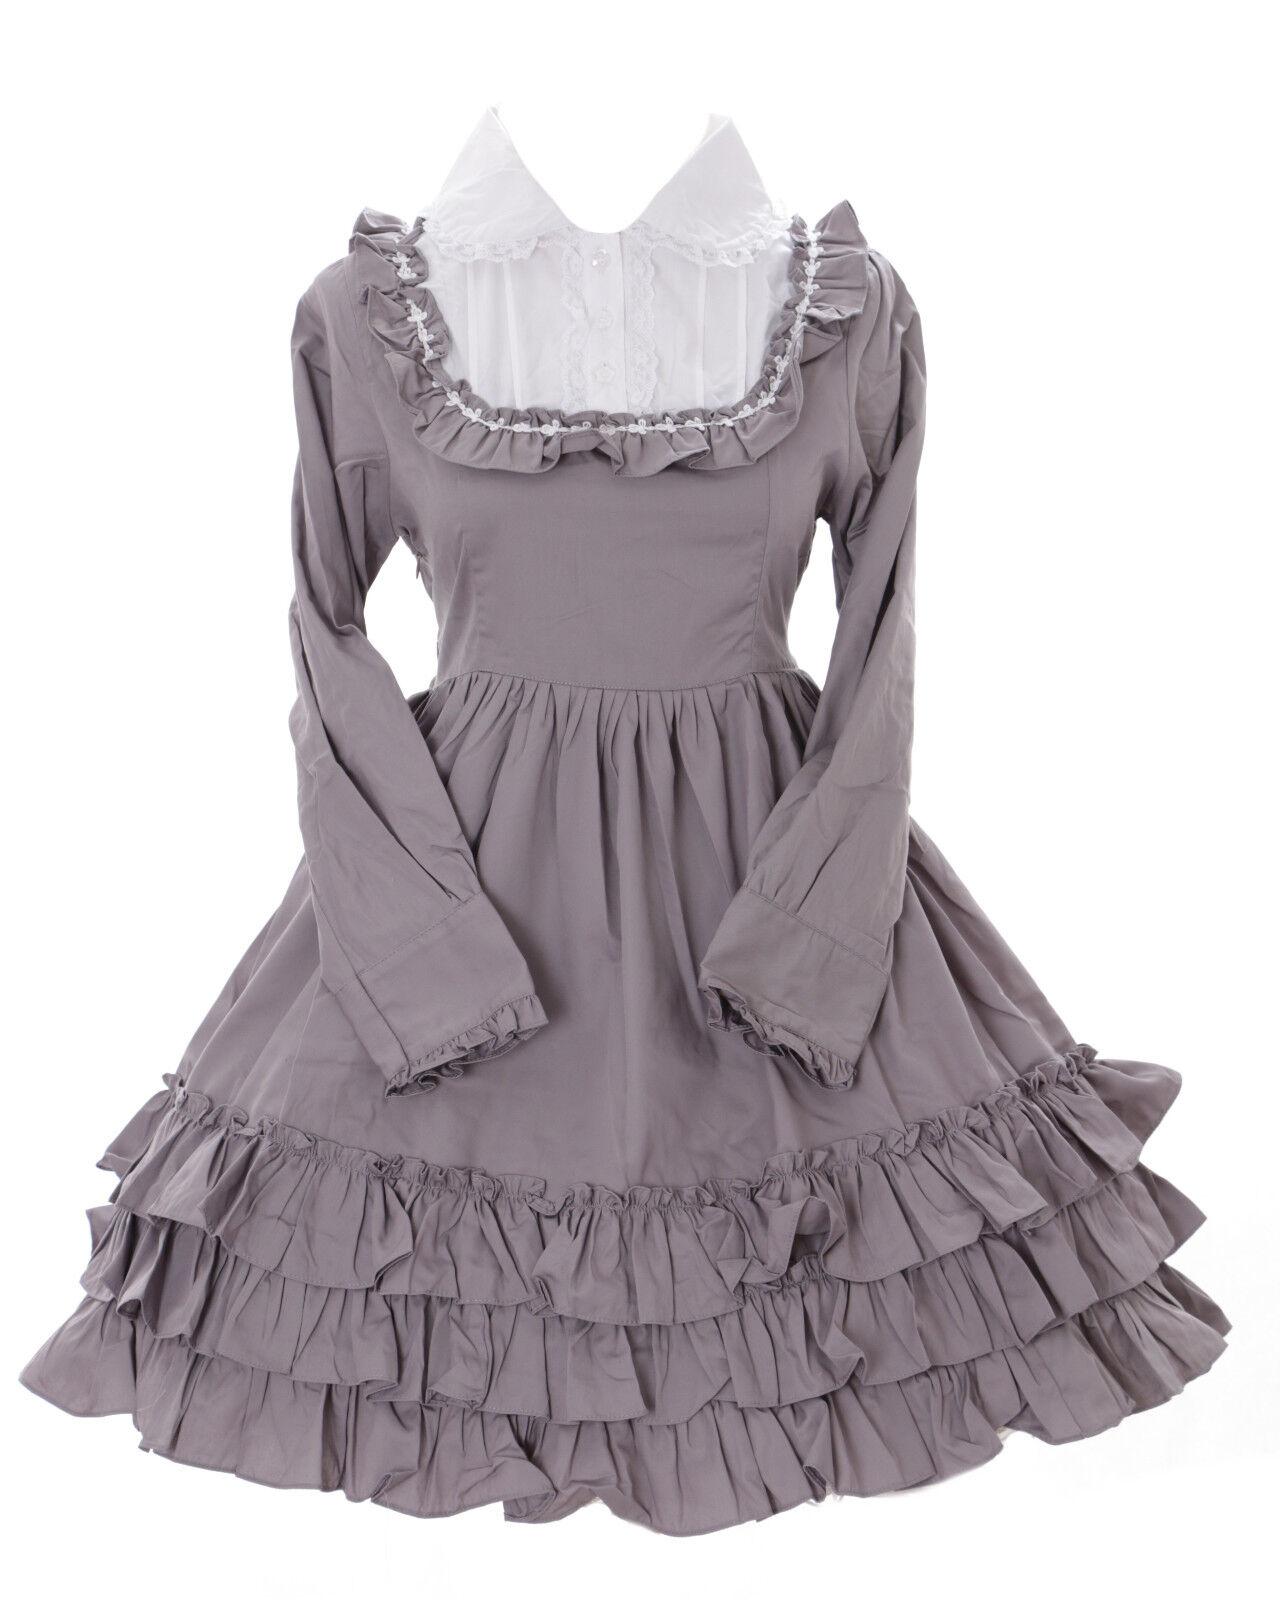 Jl-564-2 GRIGIO Gothic Lolita Giappone volant Abito Costume Dress Cosplay Babydoll